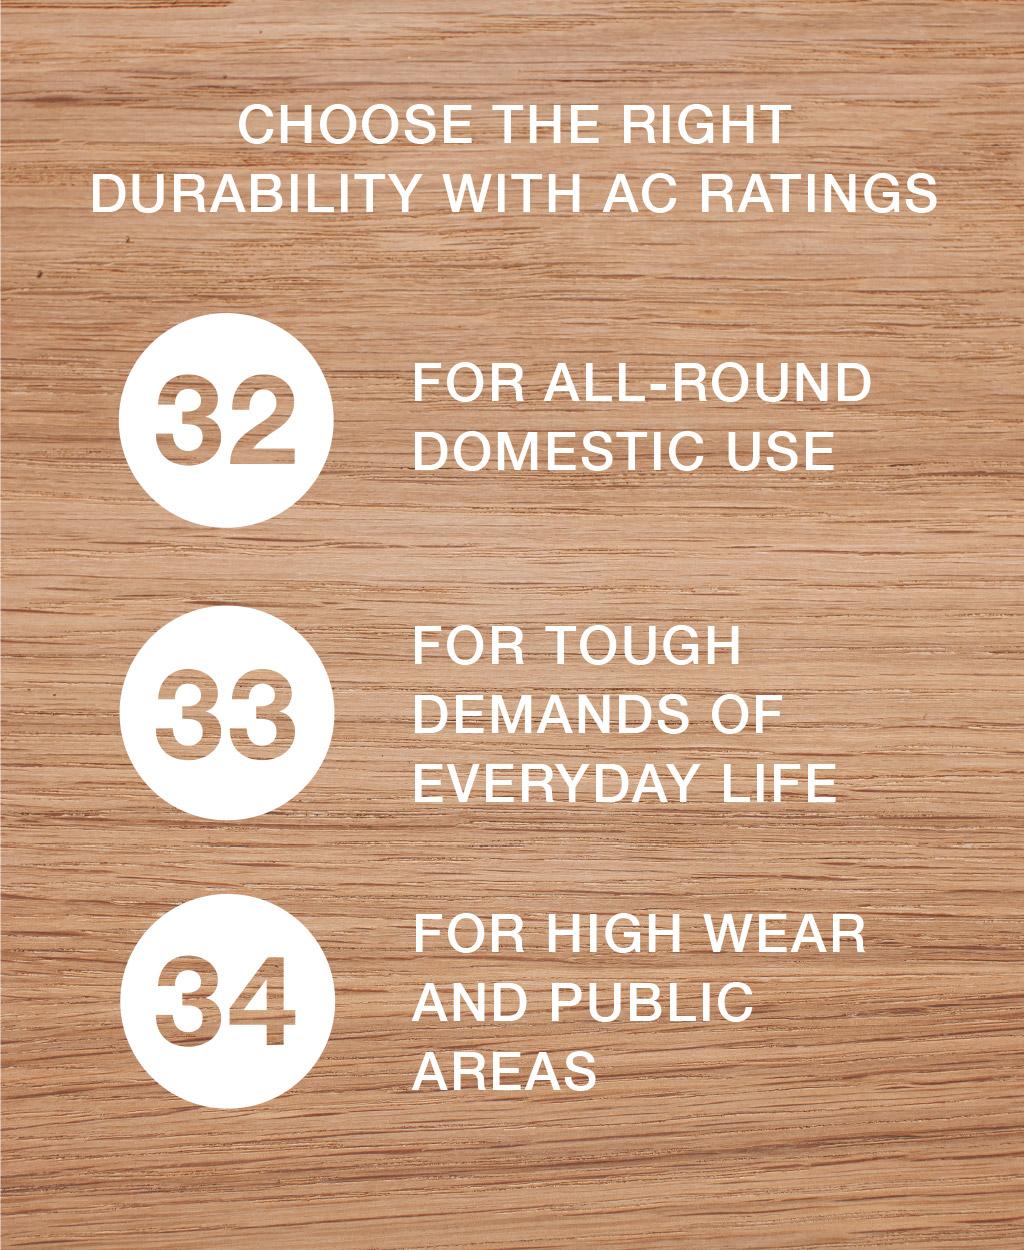 pergo-infographic-hard-wearing-oak-flooring-ac-ratings